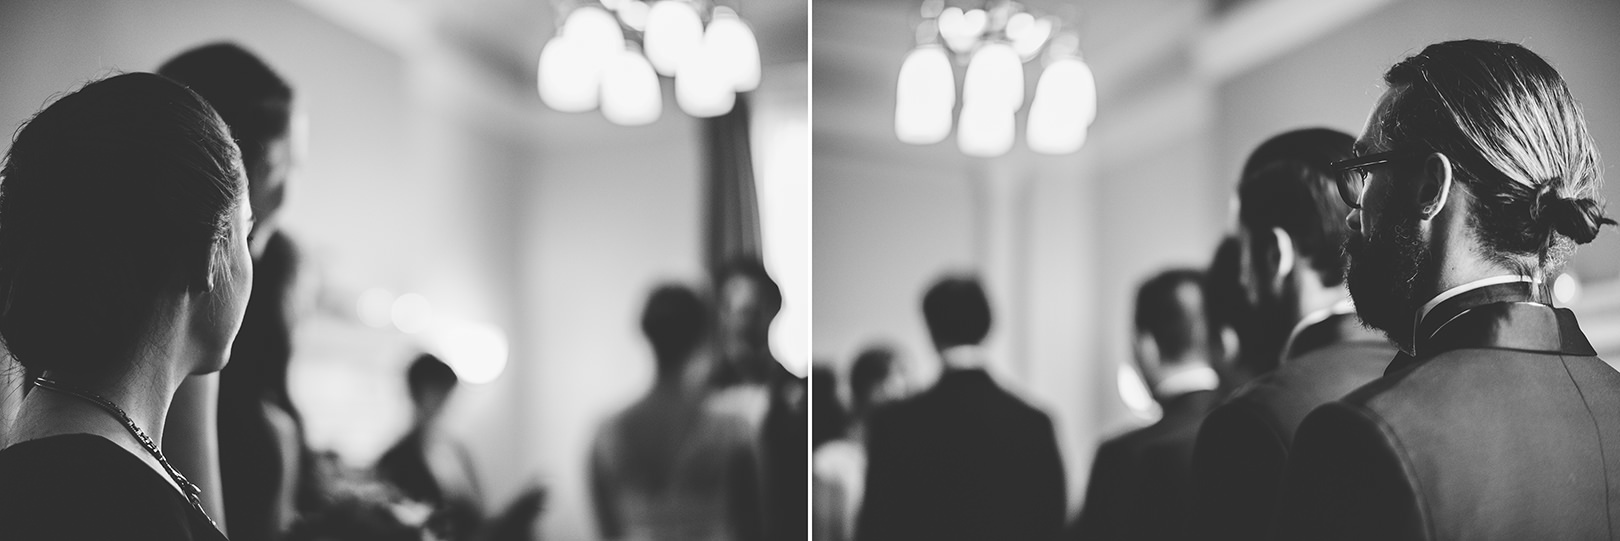 Spain Wedding Photographer - © Dallas Kolotylo Photography - 078